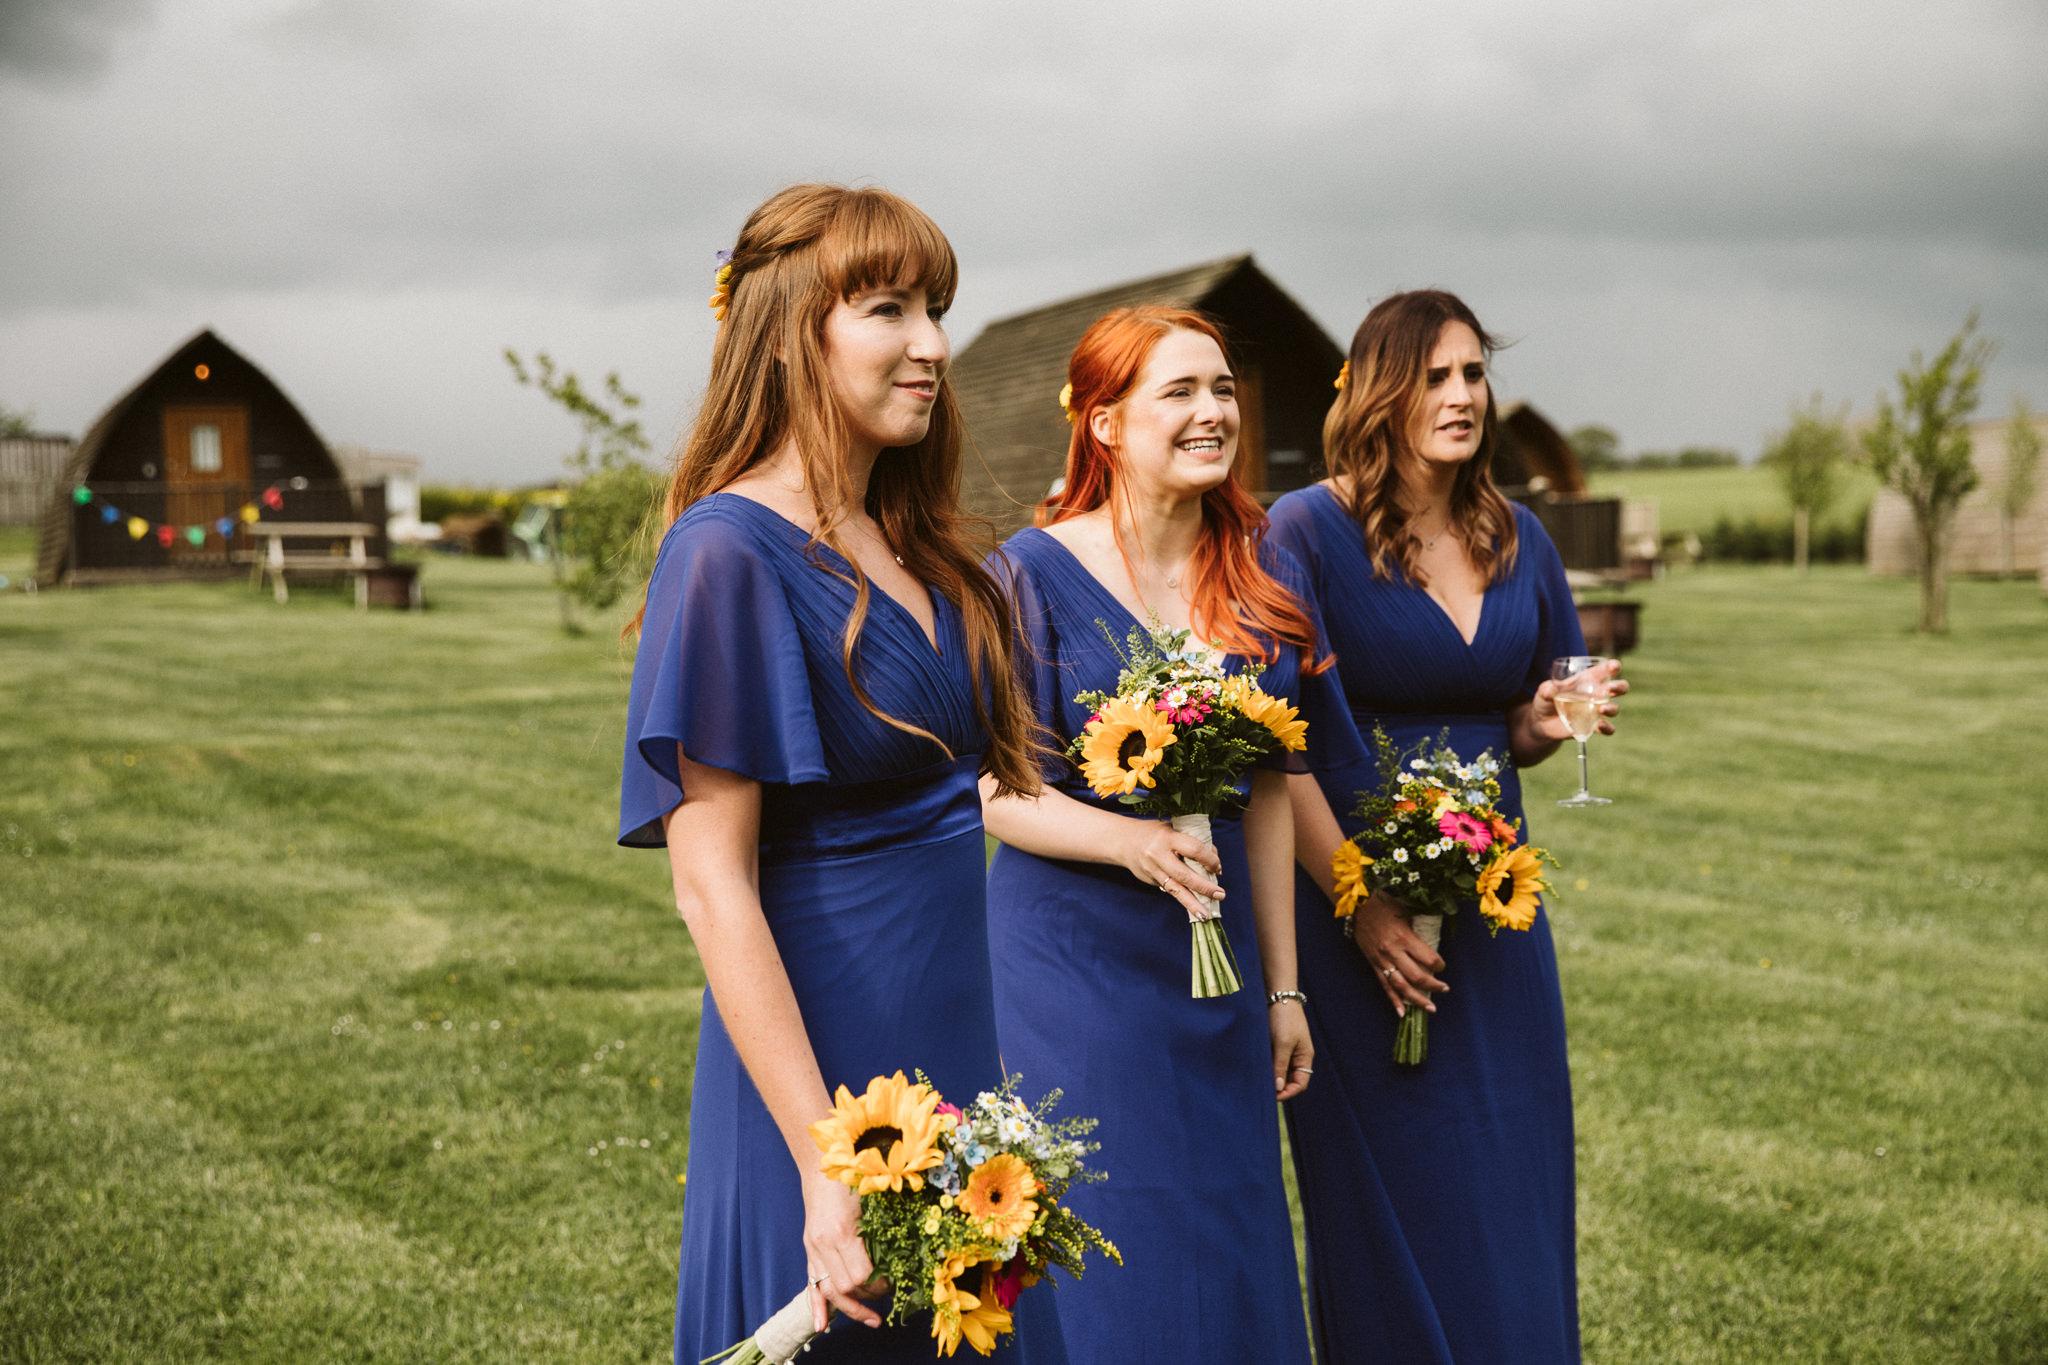 northside-farm-wedding-northumberland-margarita-hope (87).jpg